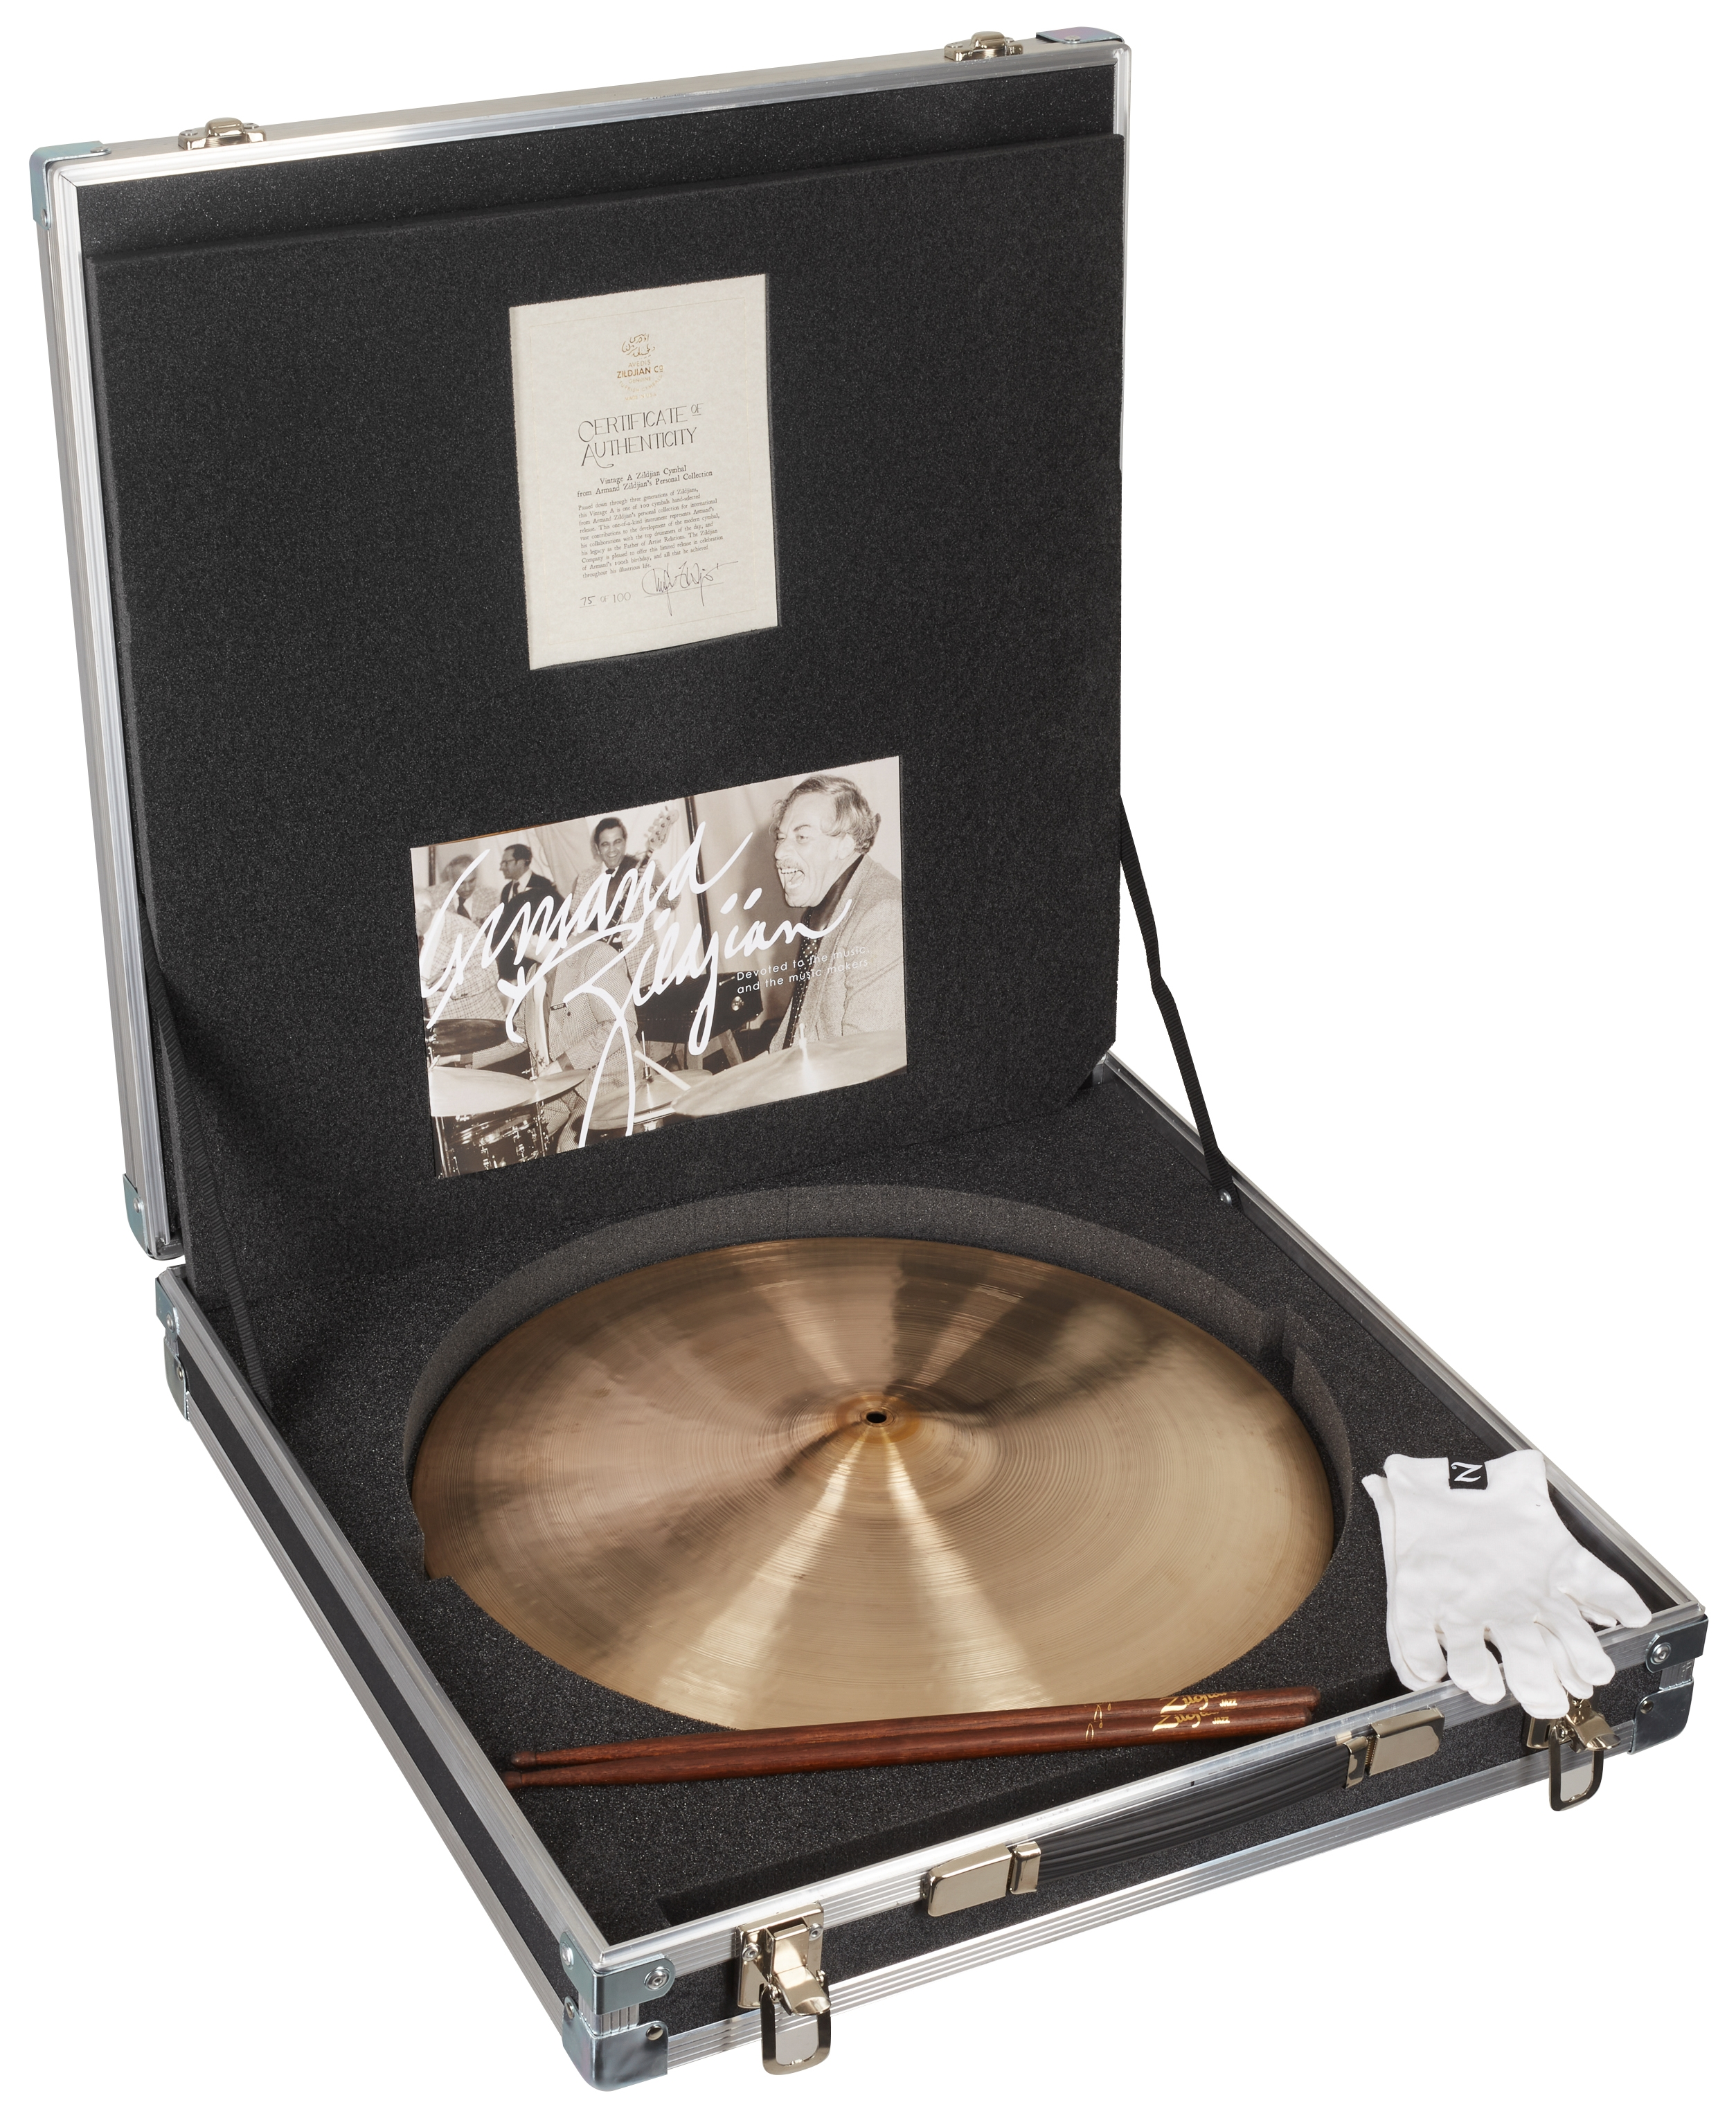 "ZILDJIAN 20"" Vintage Armand Zildjian Personal Collection"